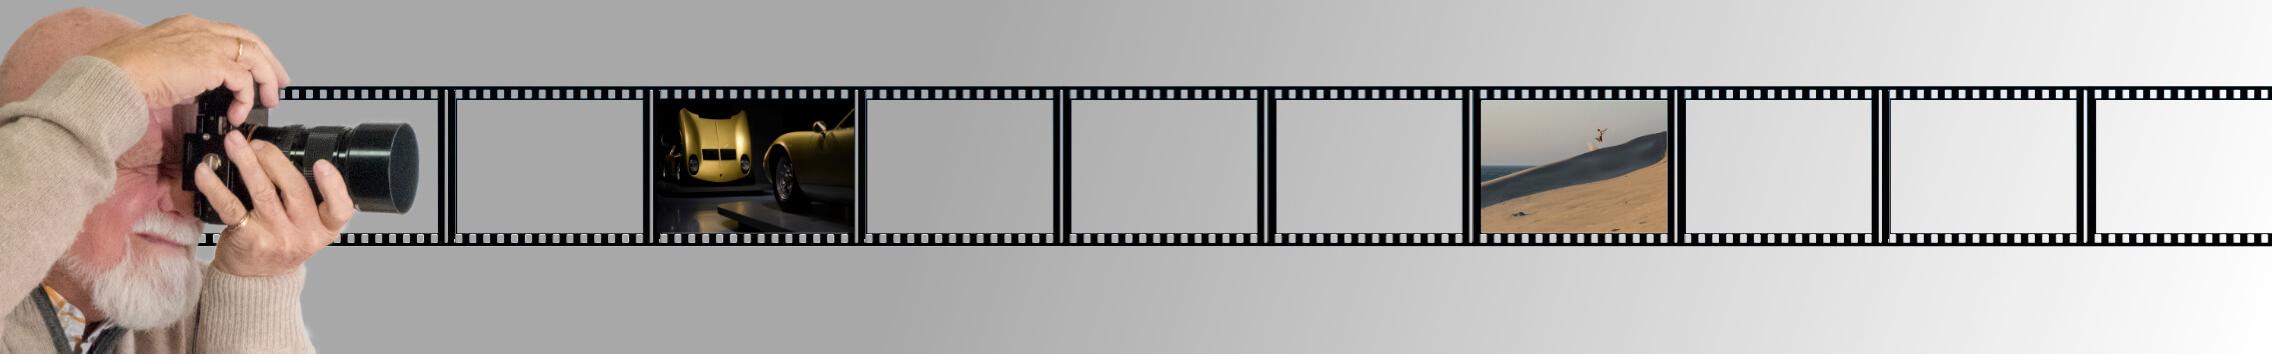 FilmstreifenB